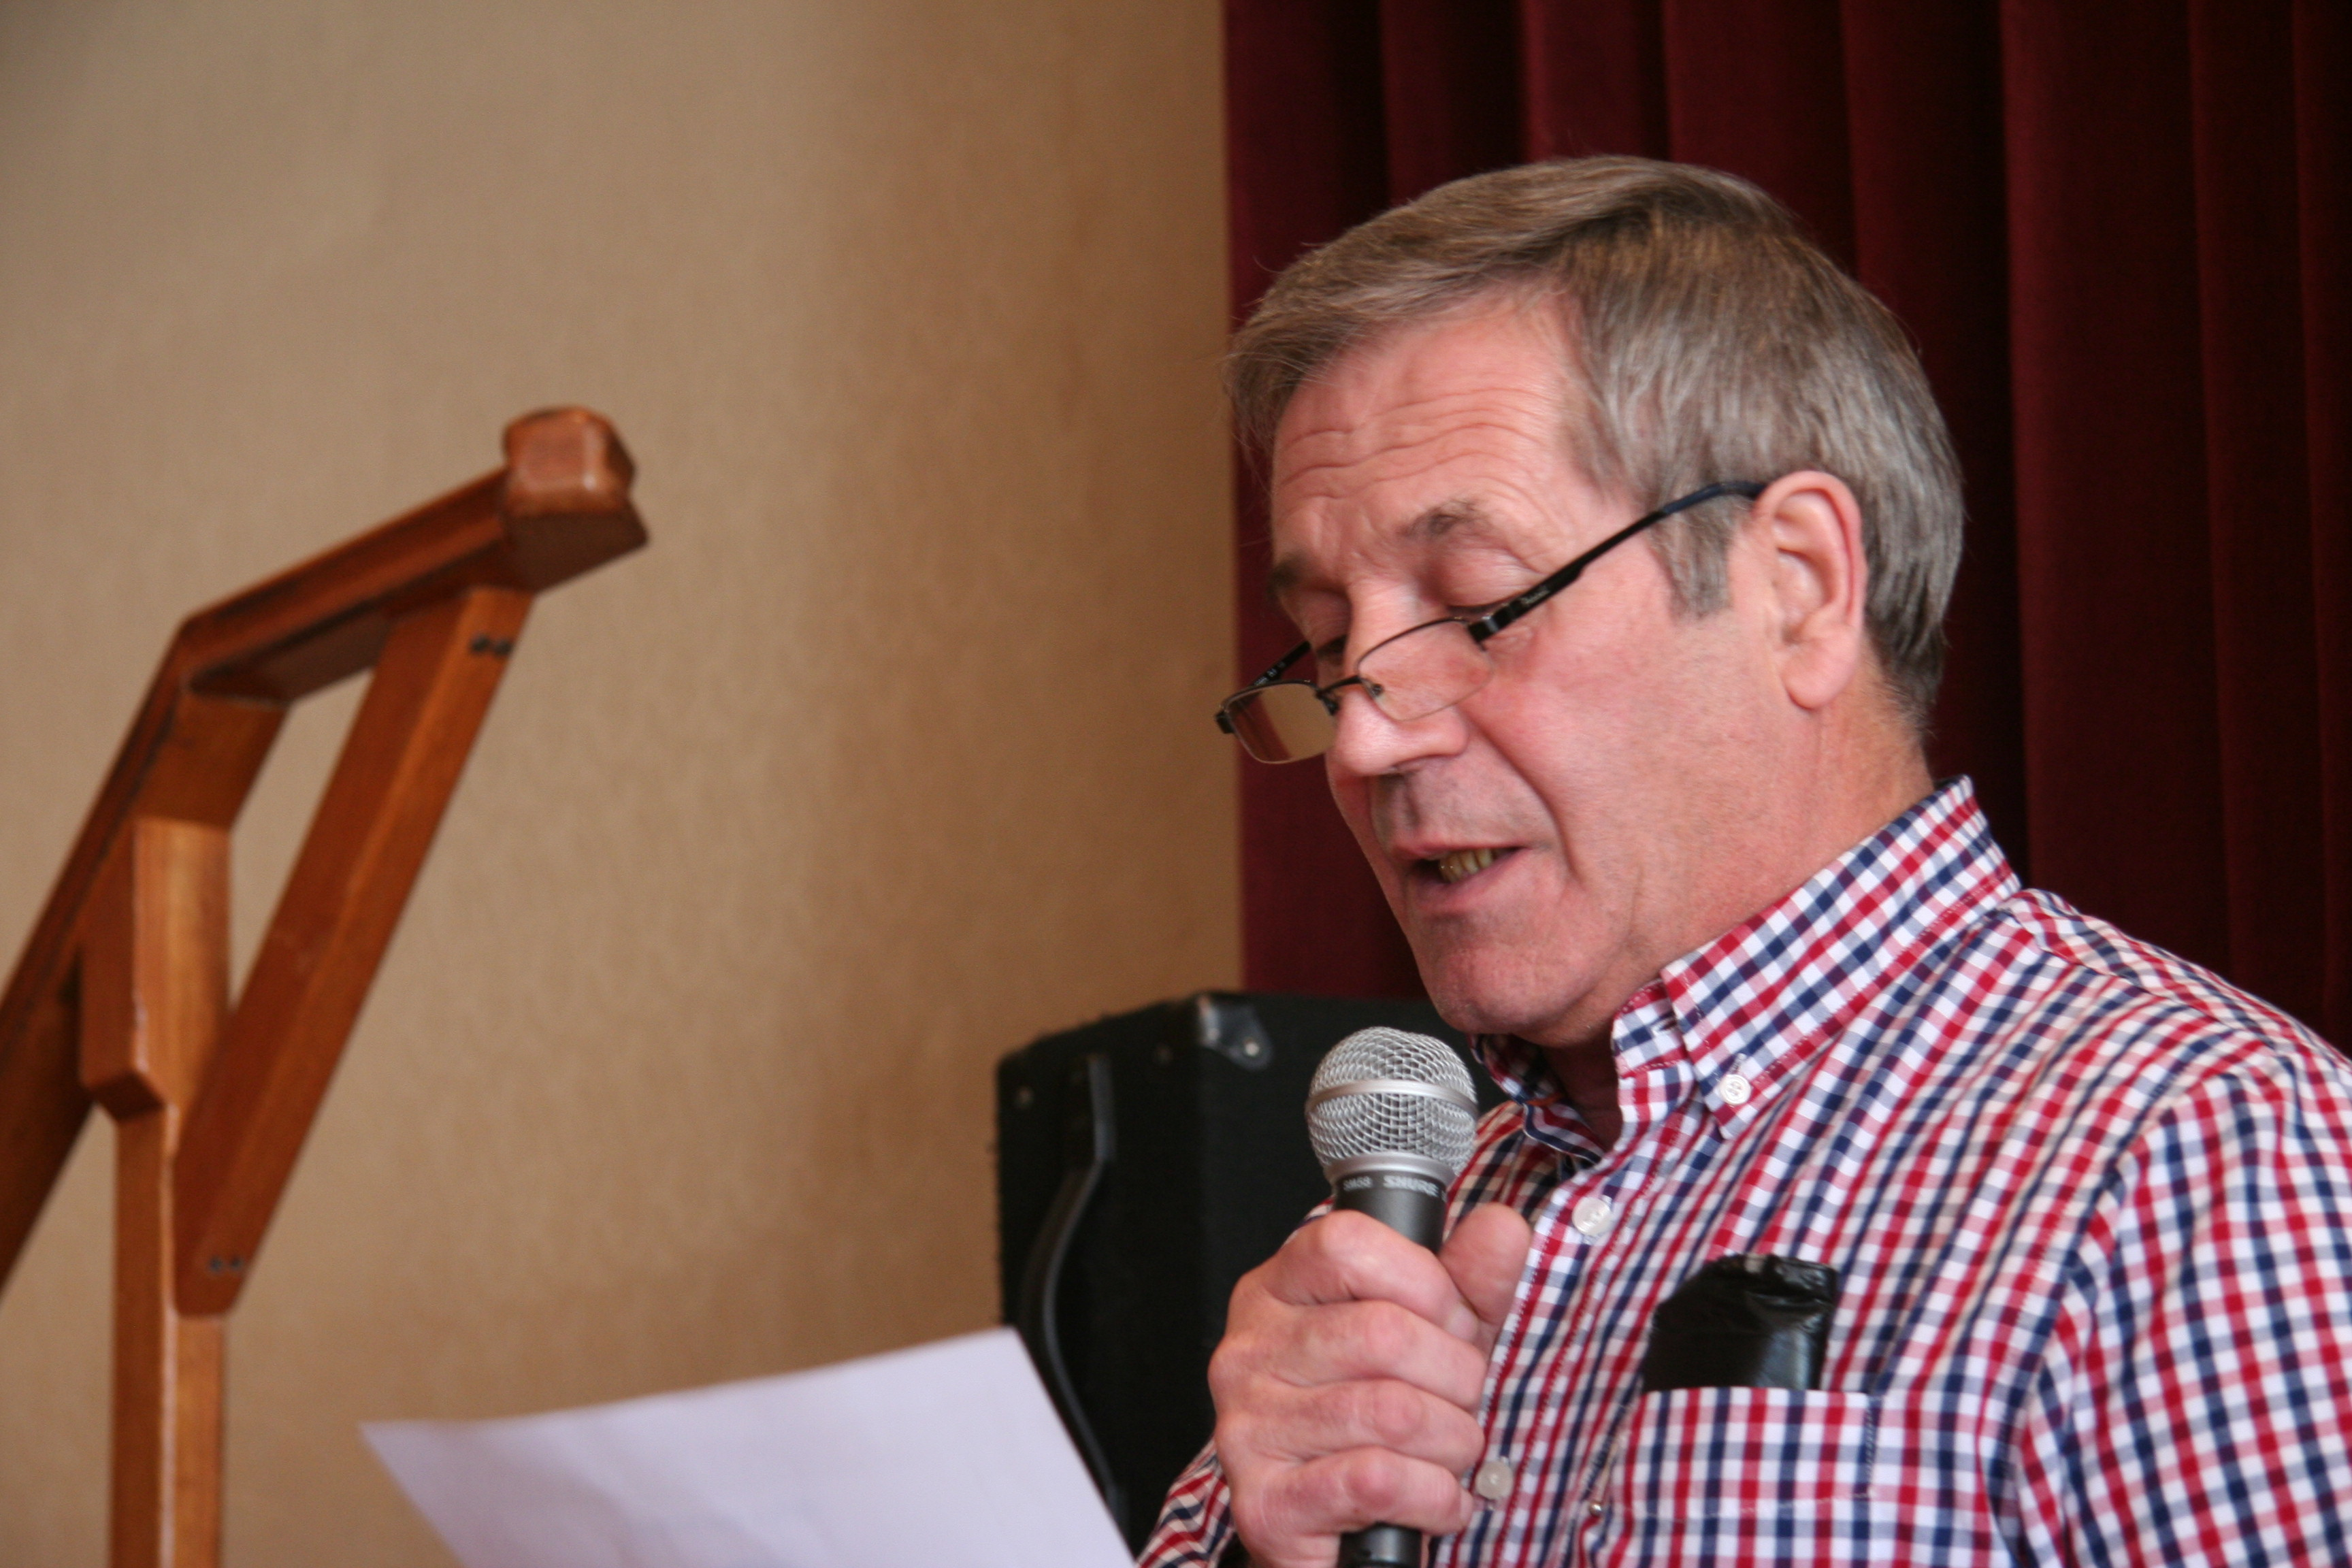 Martin Goicoechea